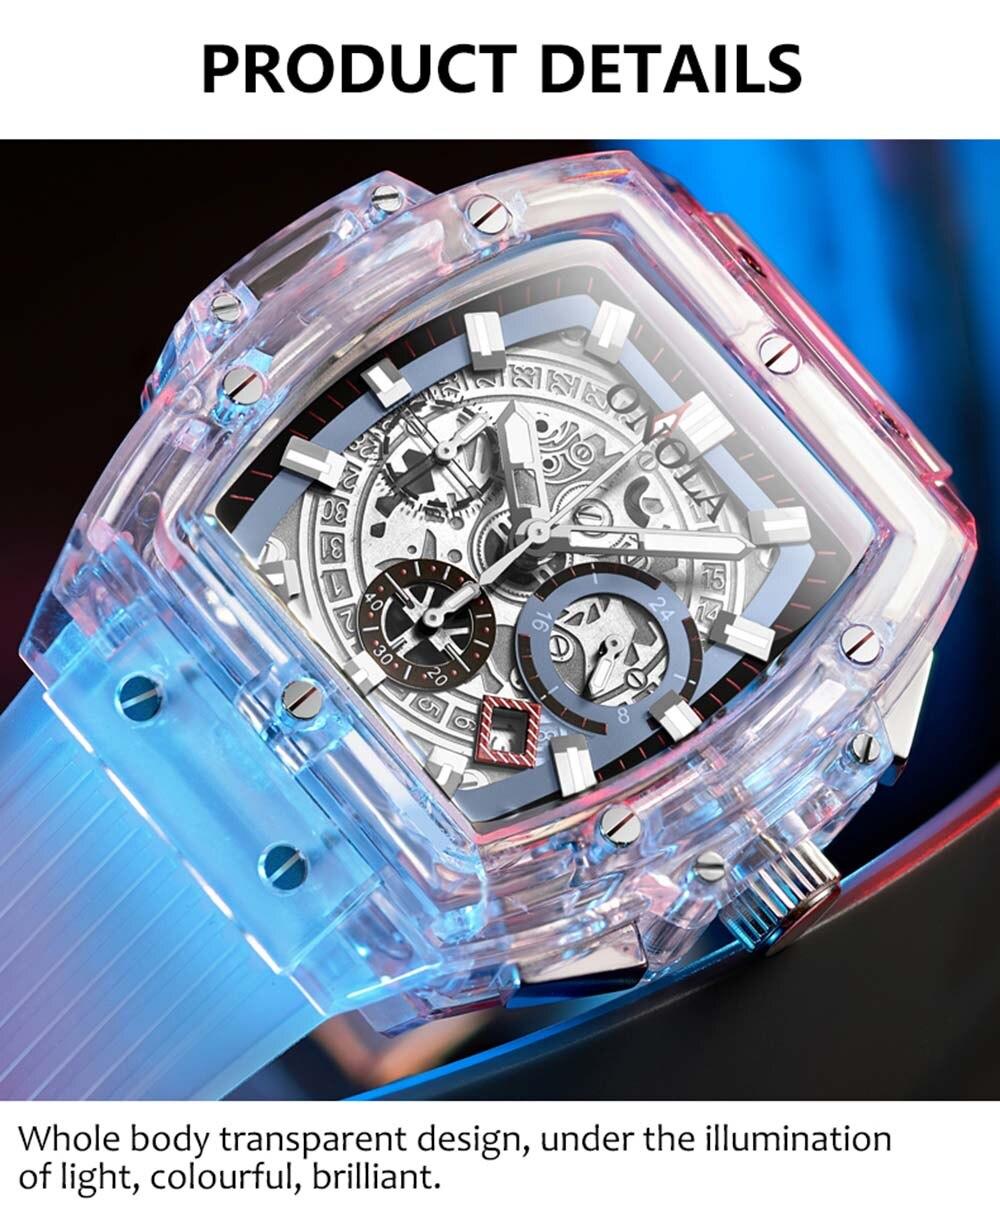 HTB1zFKjXpT7gK0jSZFpq6yTkpXac luxury mens wristwatches Transparent quartz waterproof Multifunction man watches square white fashion clocks